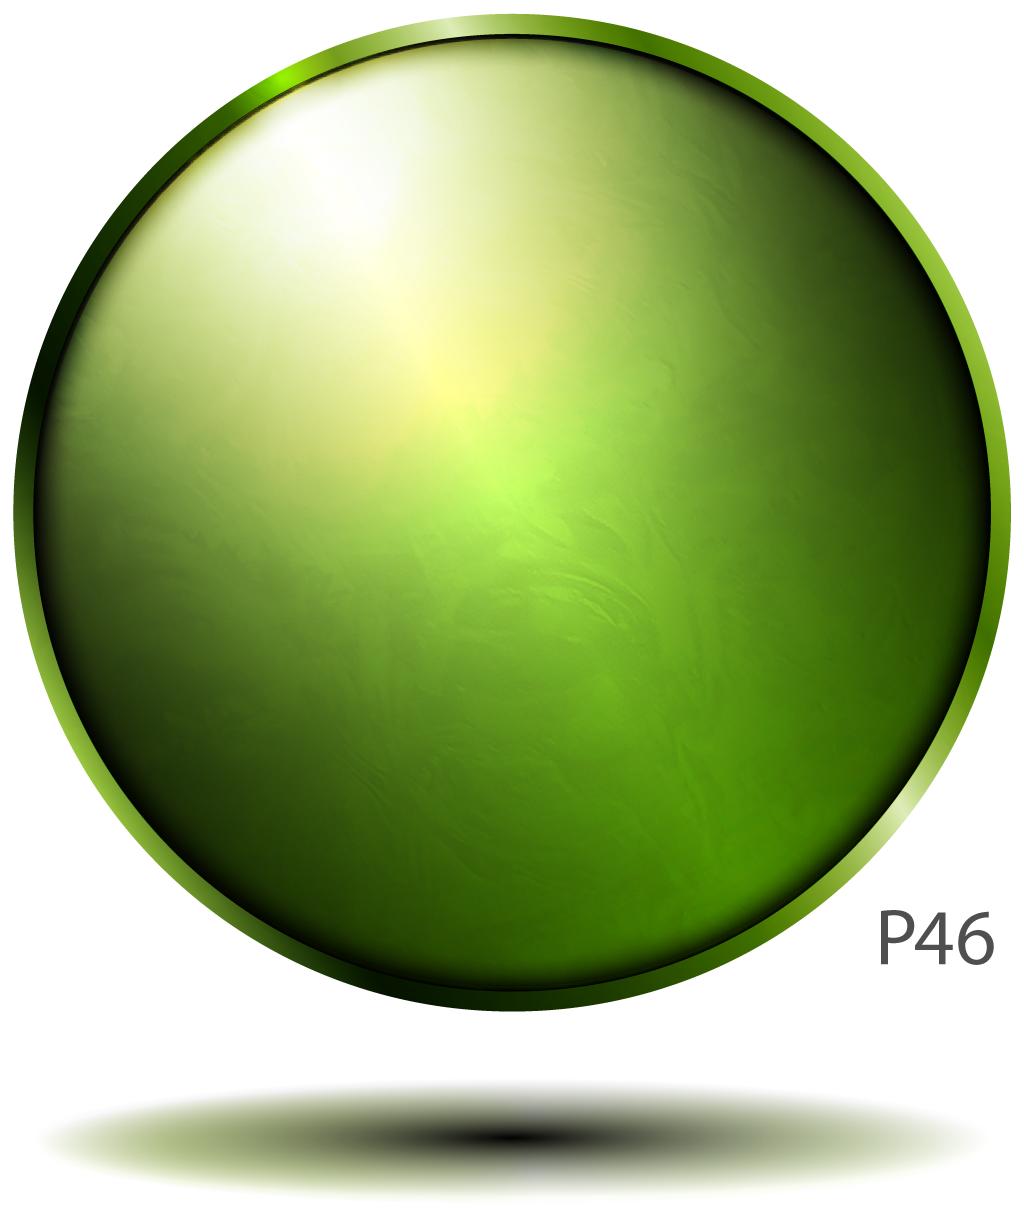 P46 phosphor screen illustration.